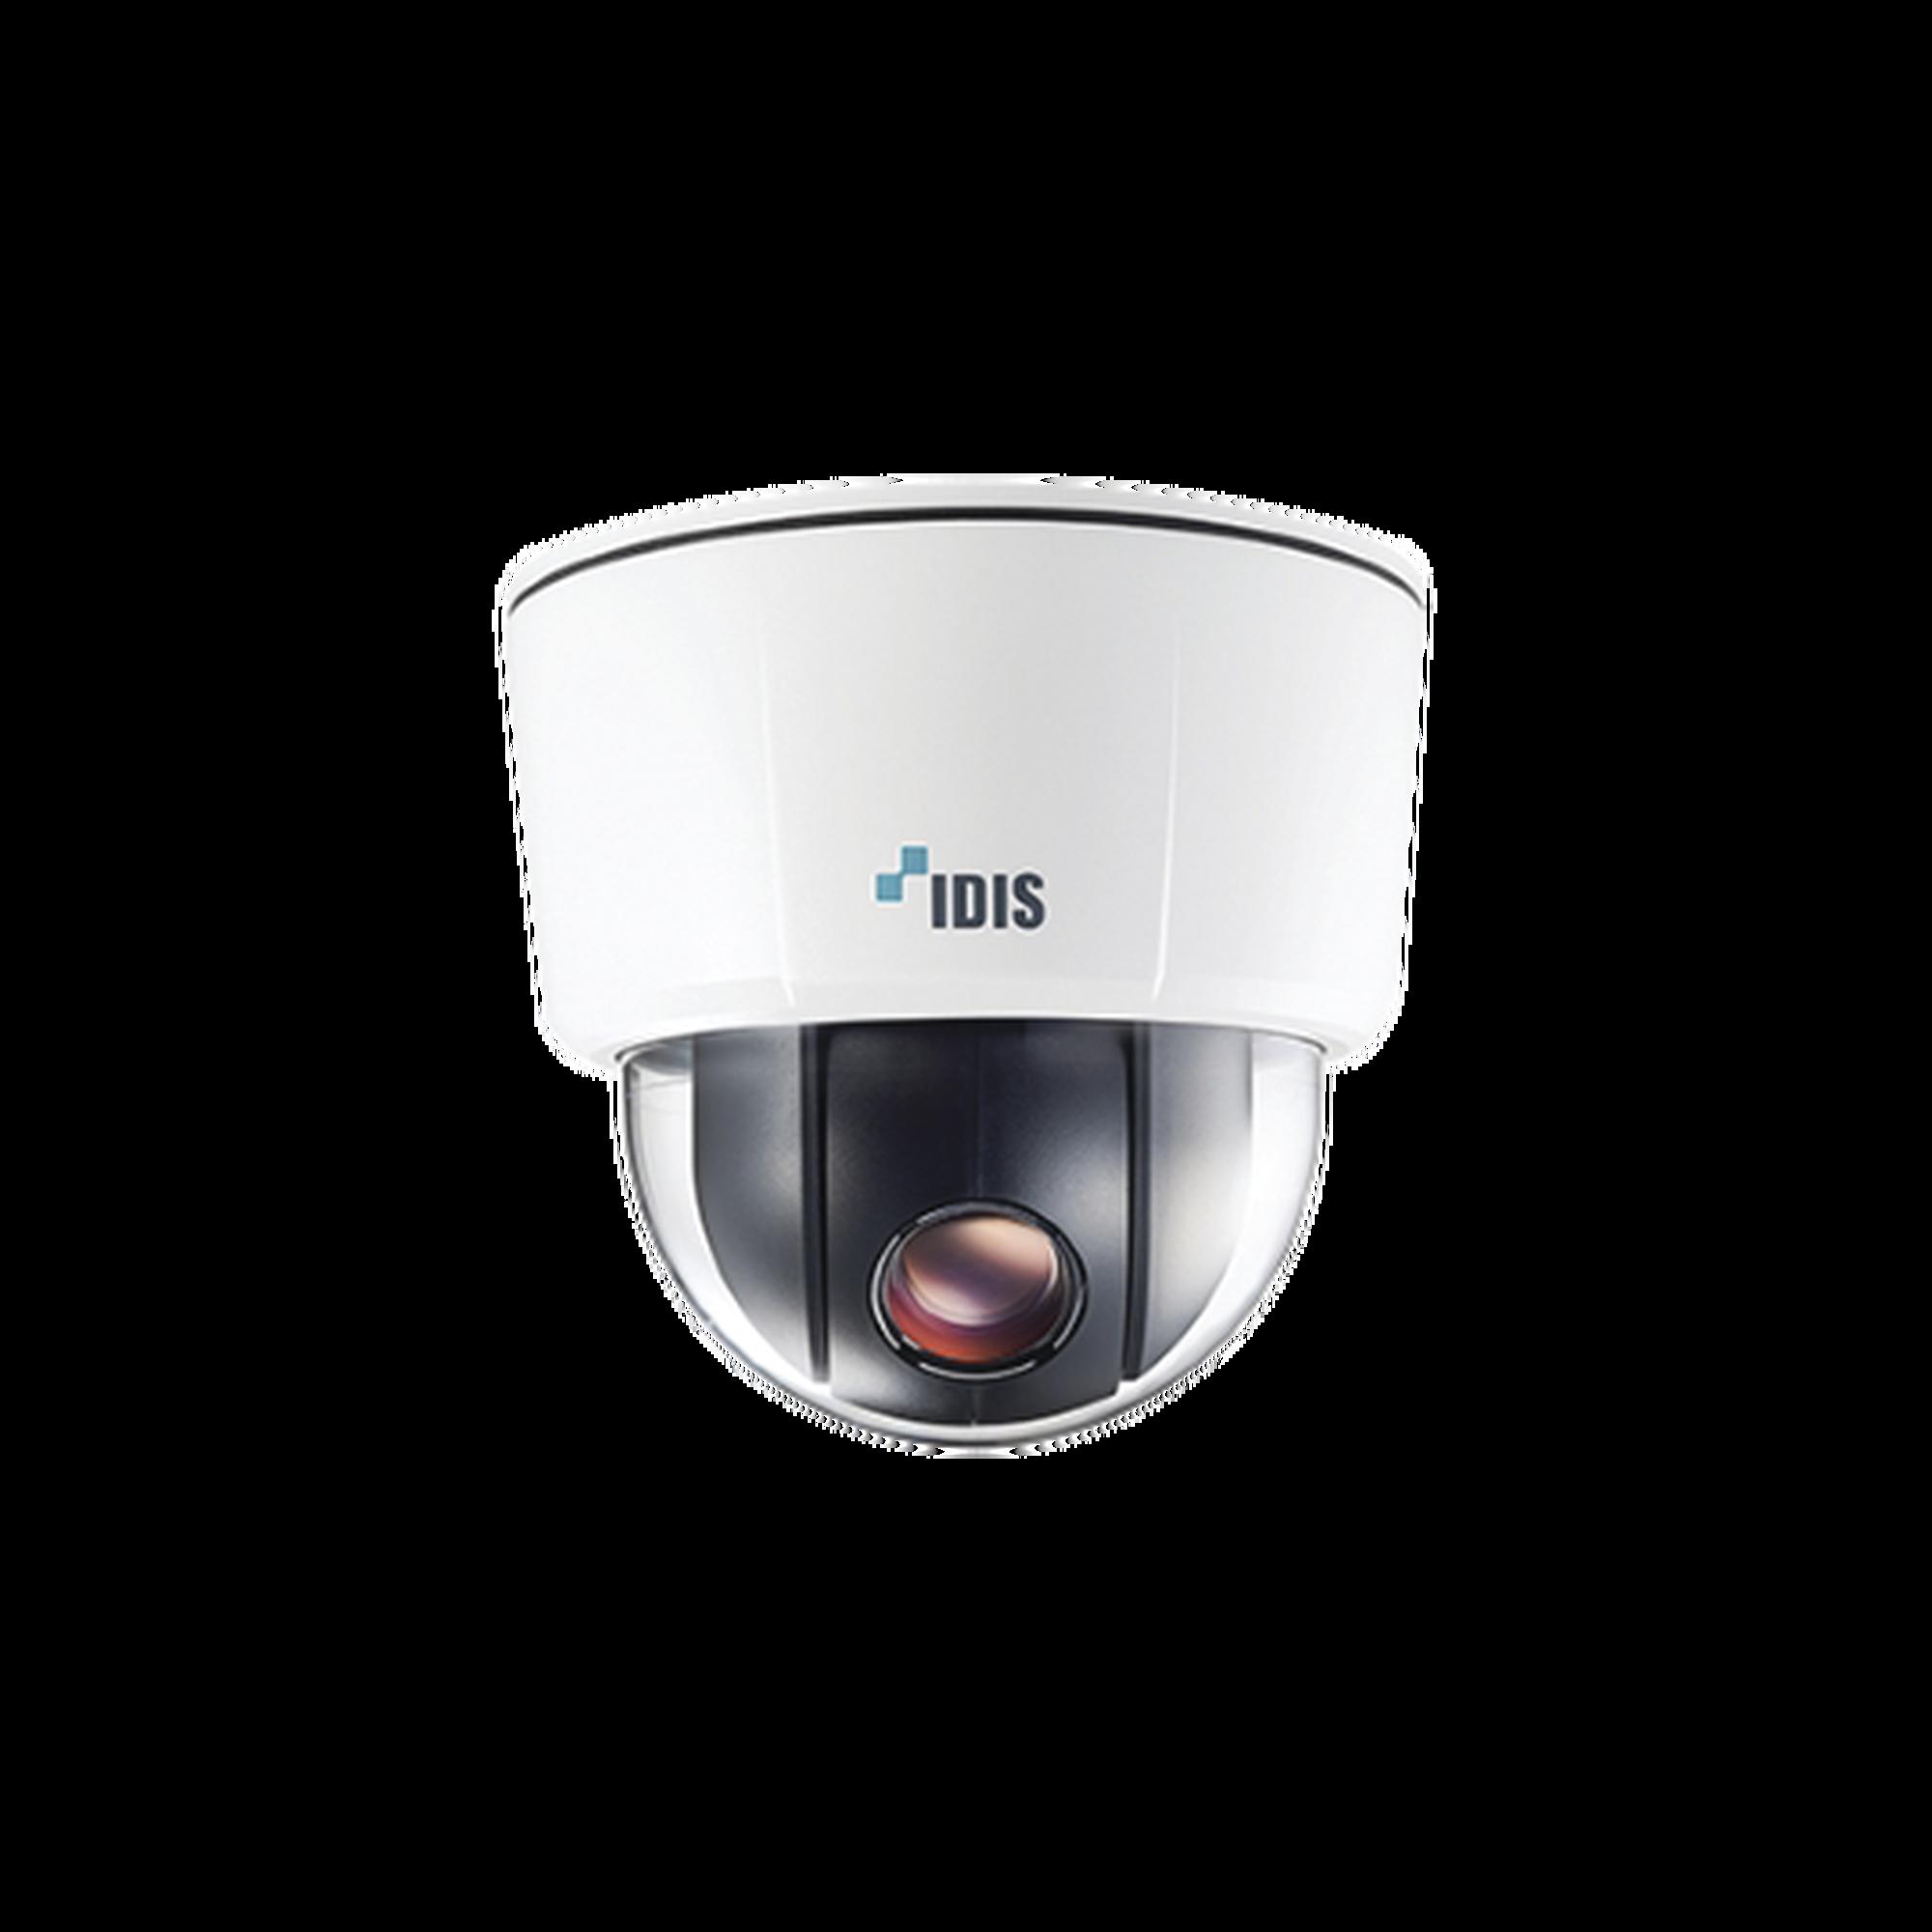 Camara Domo PTZ IP 2MP (1080p)| 30X de Zoom | Dia/Noche Real ICR | WDR Real | Video Análisis | IP67 para Exterior | DirectIP